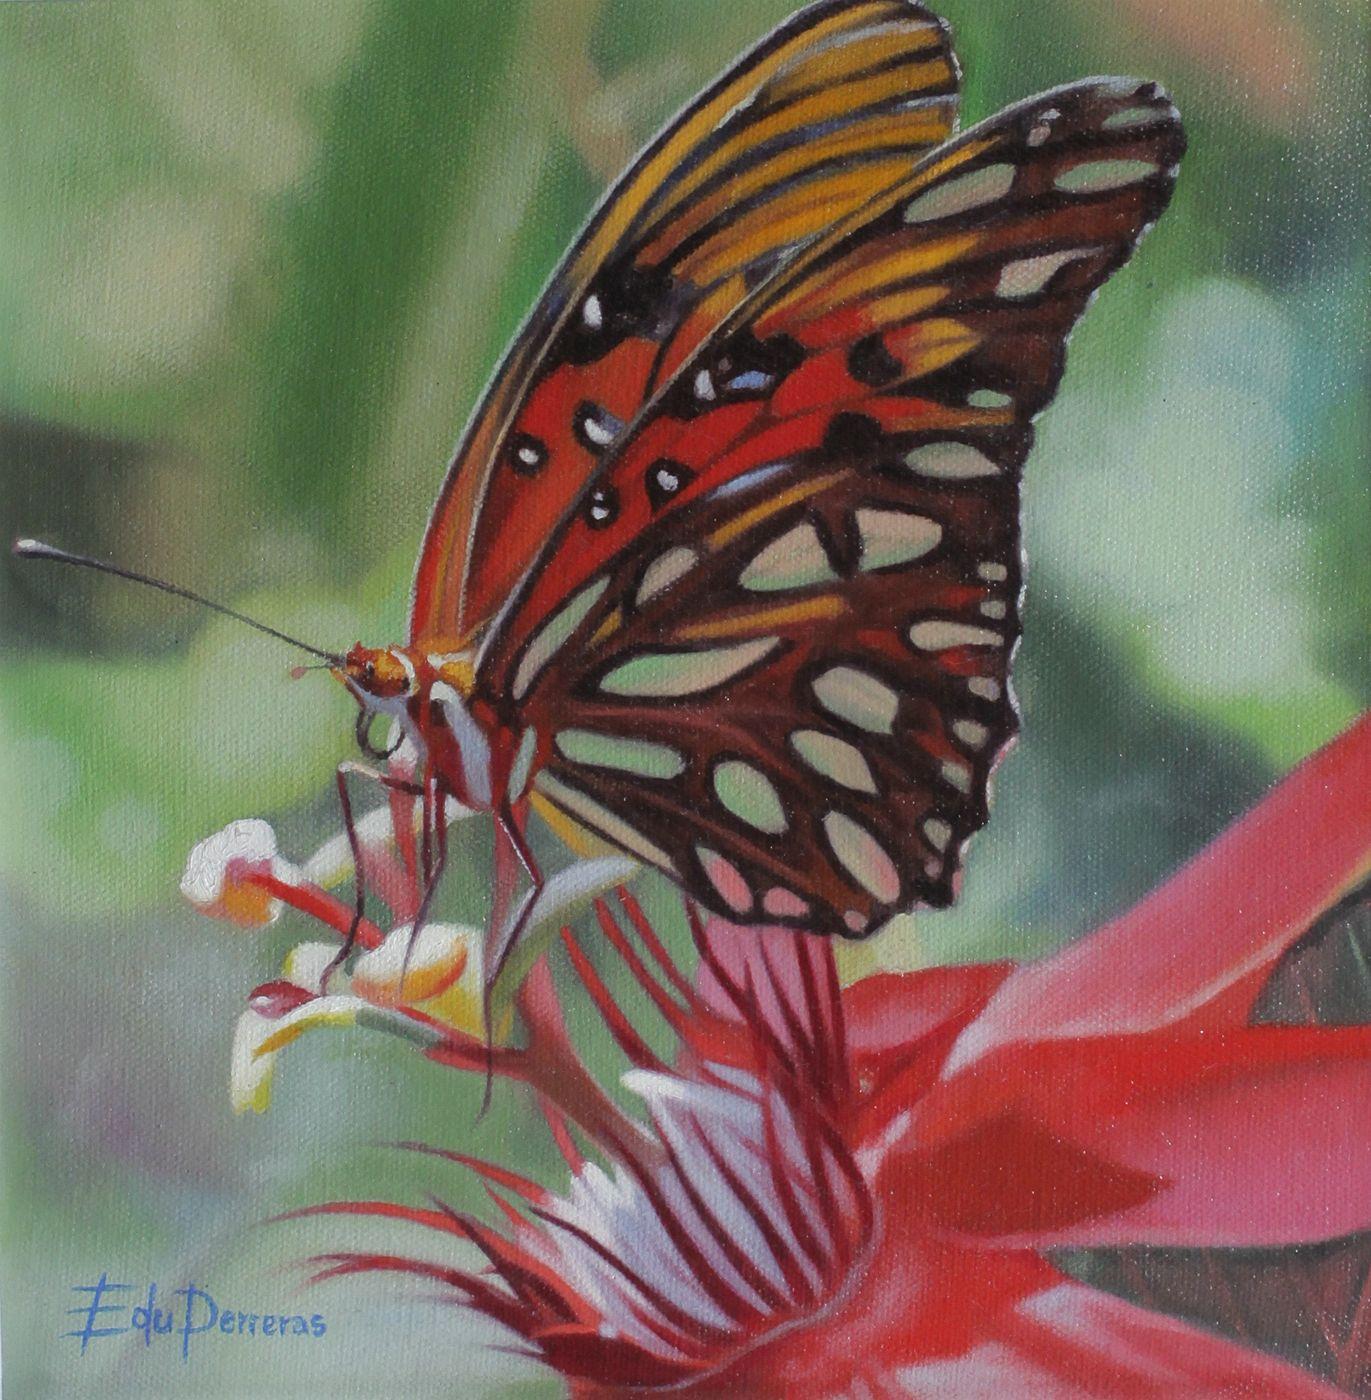 Edu Perreras Collection Filipino art, Art gallery, Art